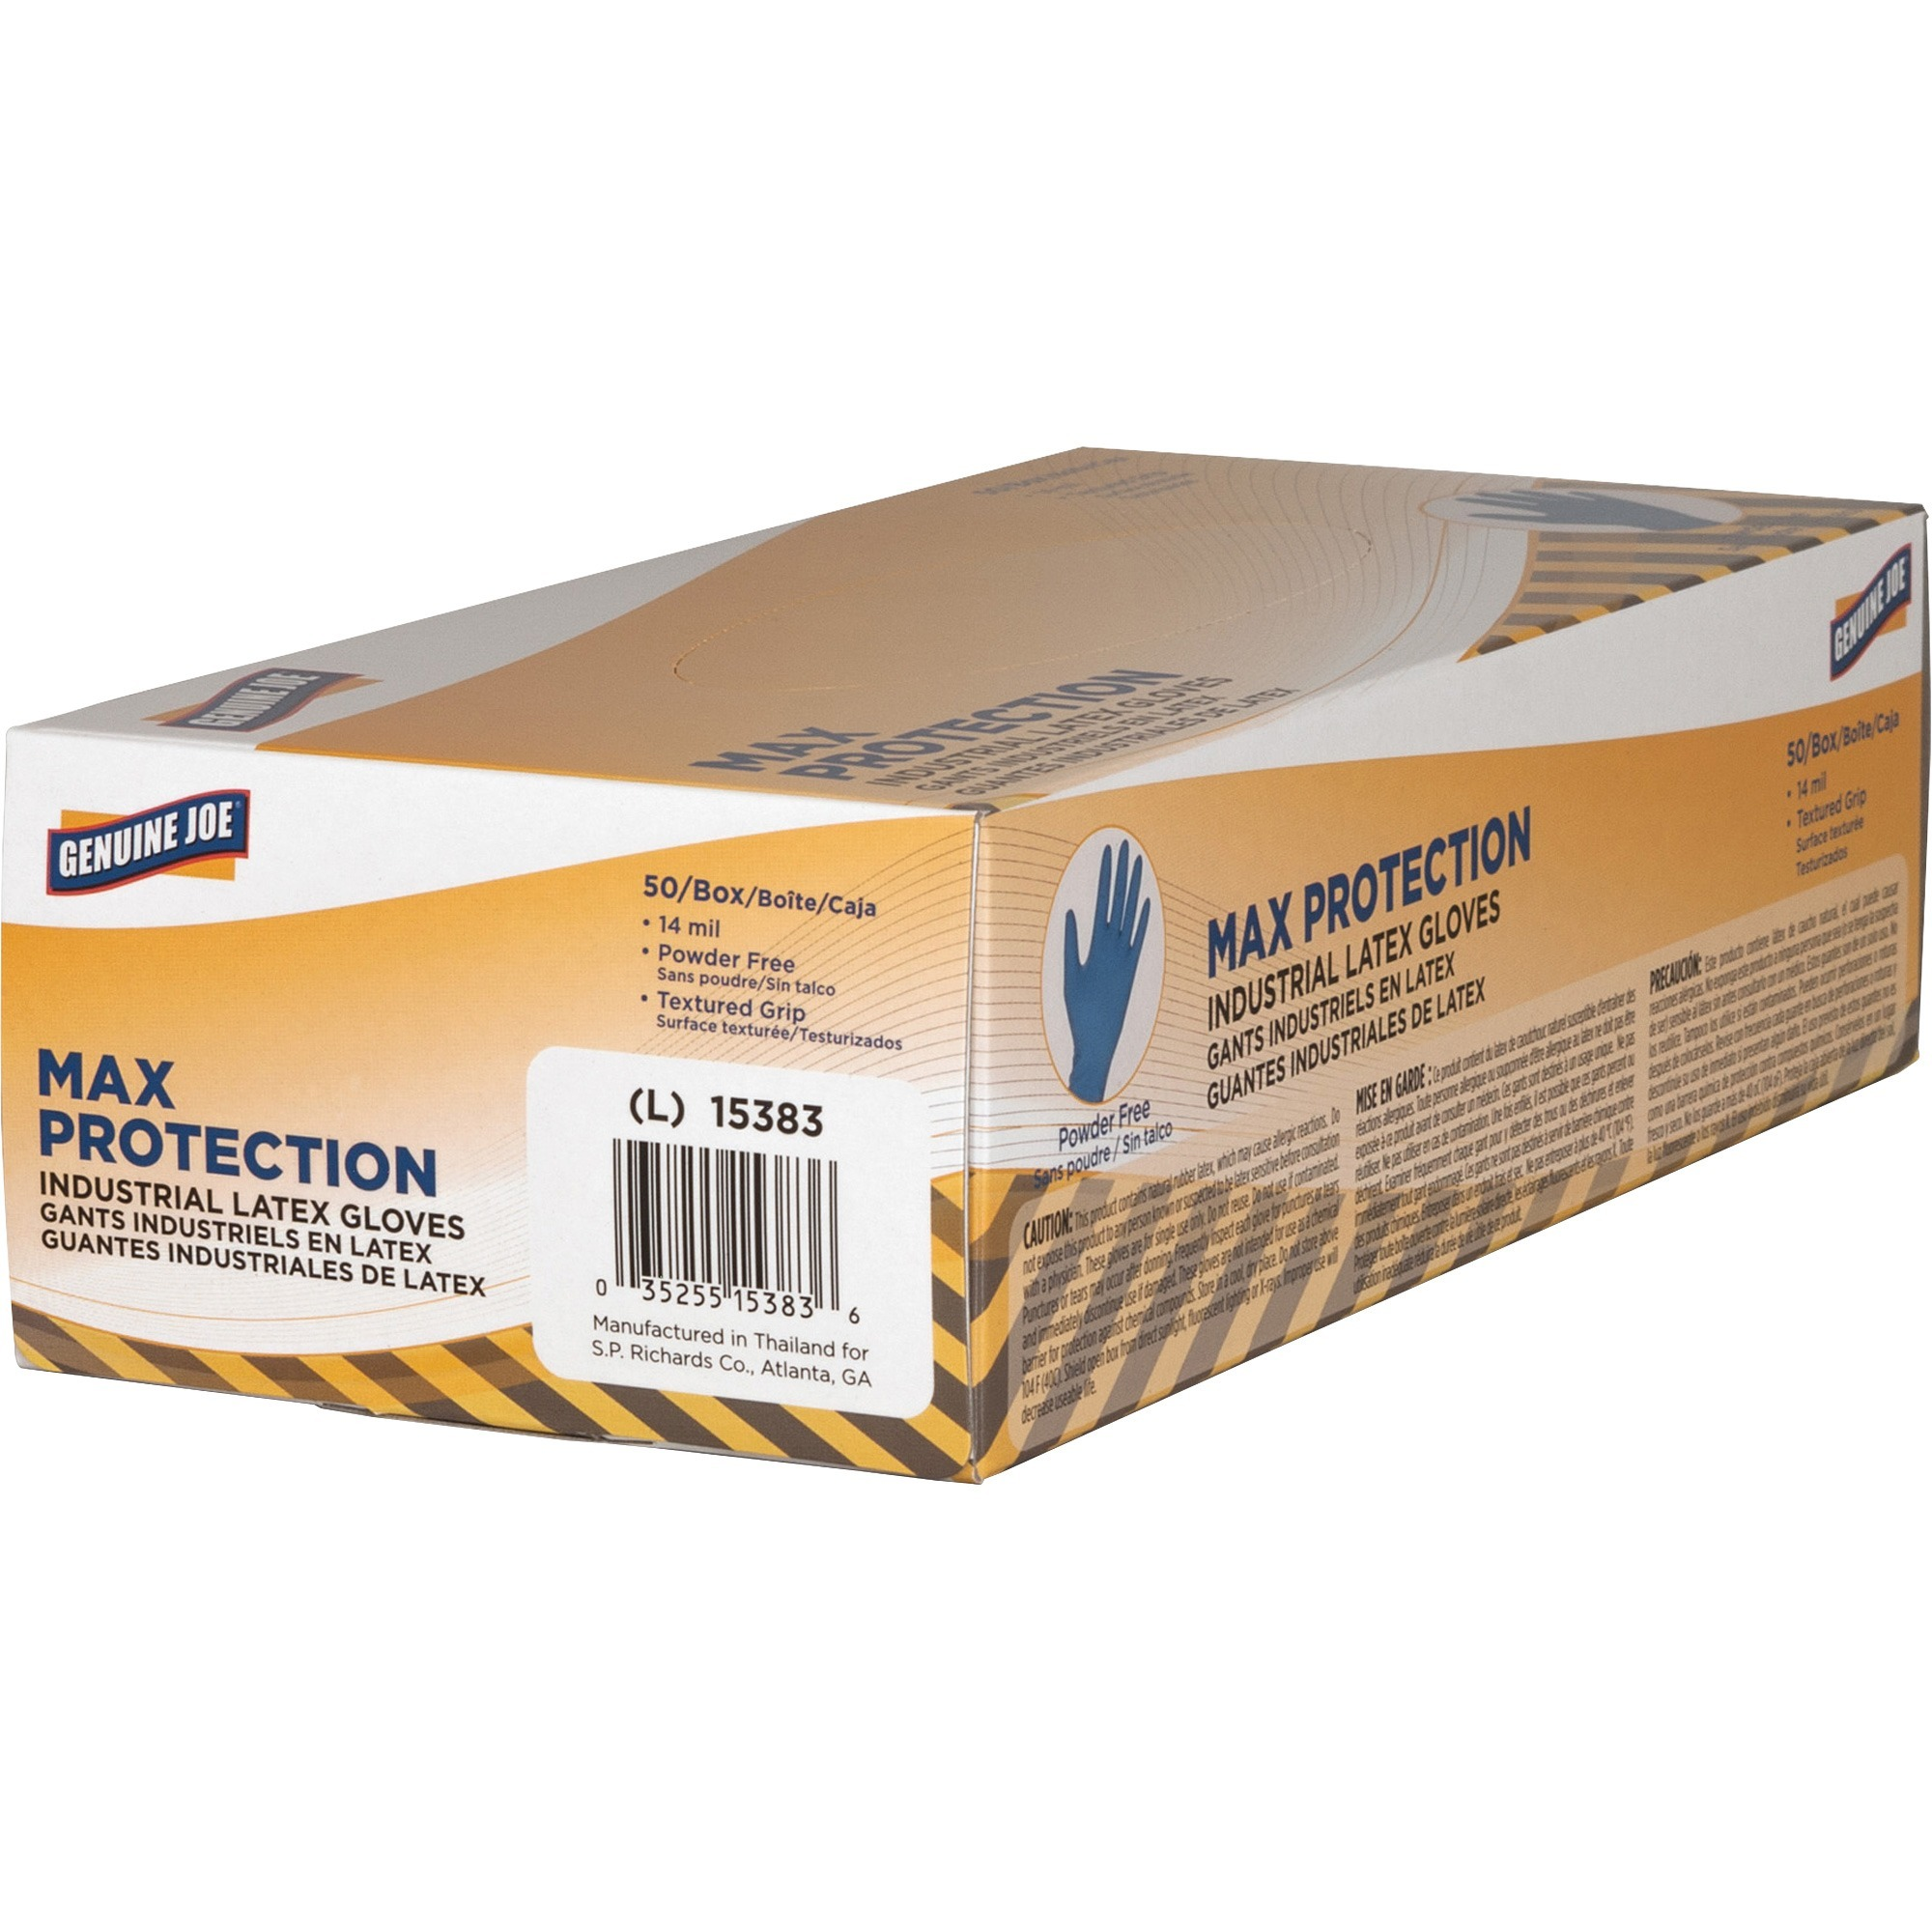 Genuine Joe 14 Mil Max Protection Ind Latex Gloves